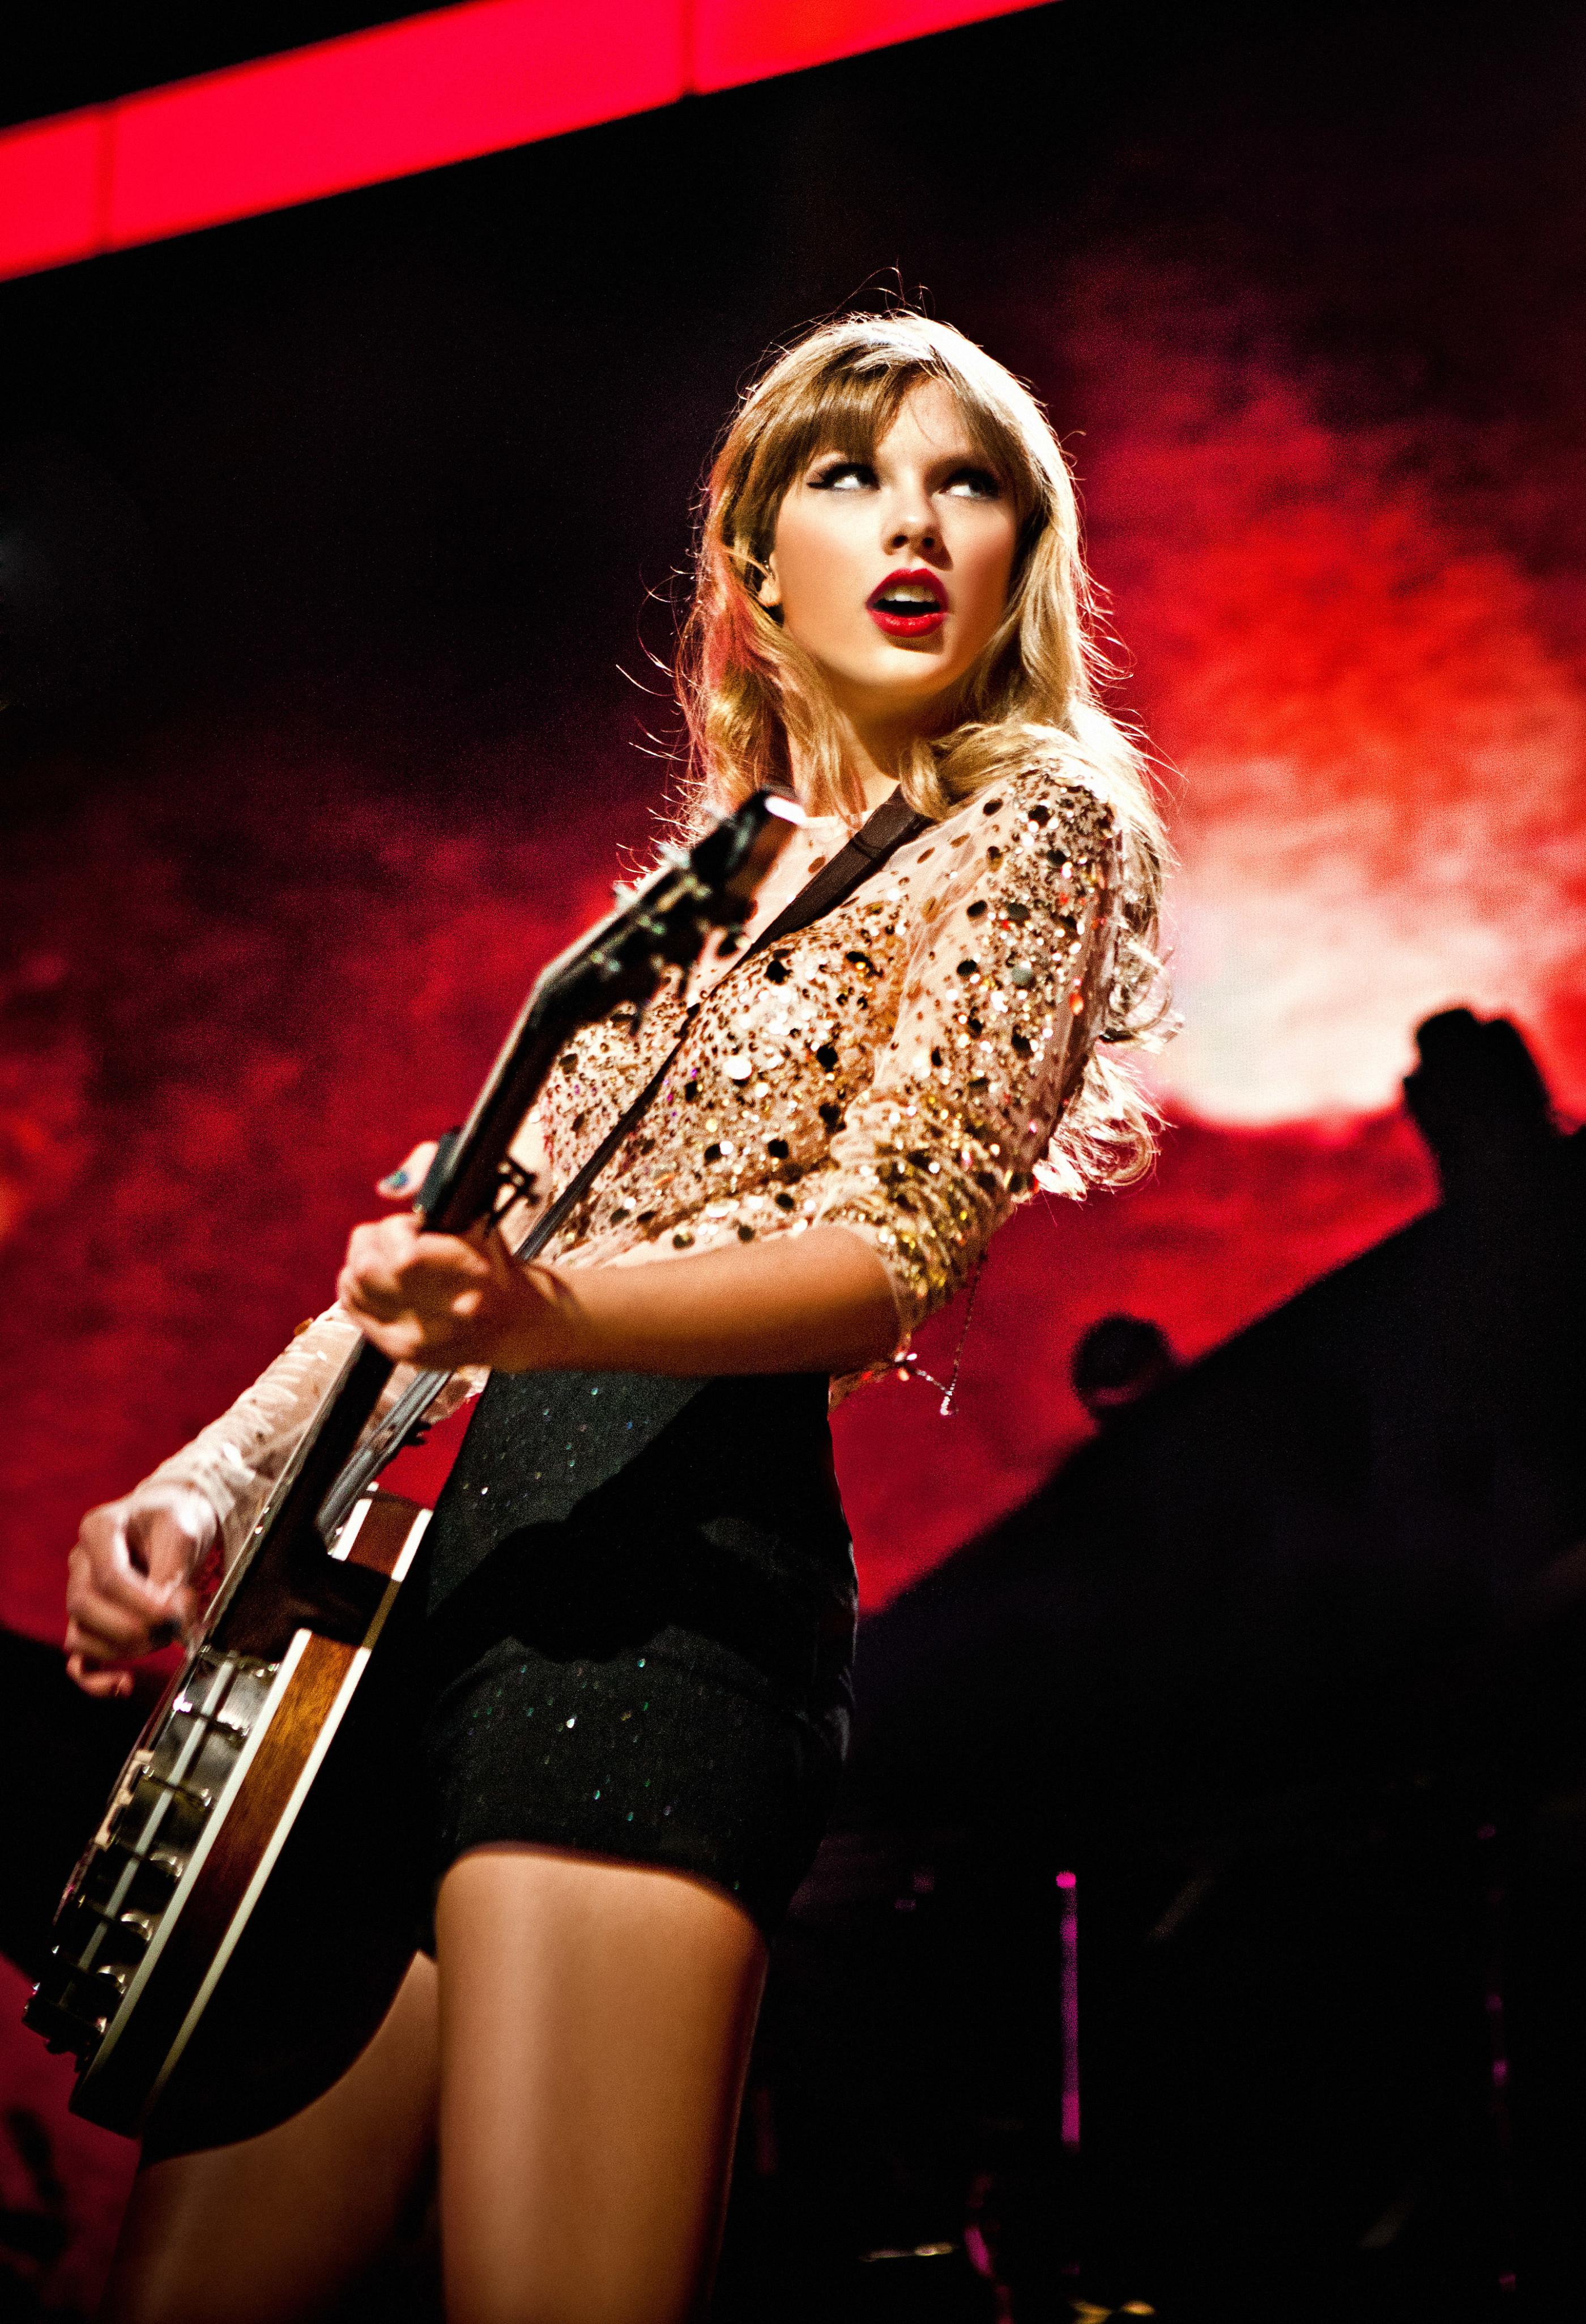 Taylor Swift live 2012